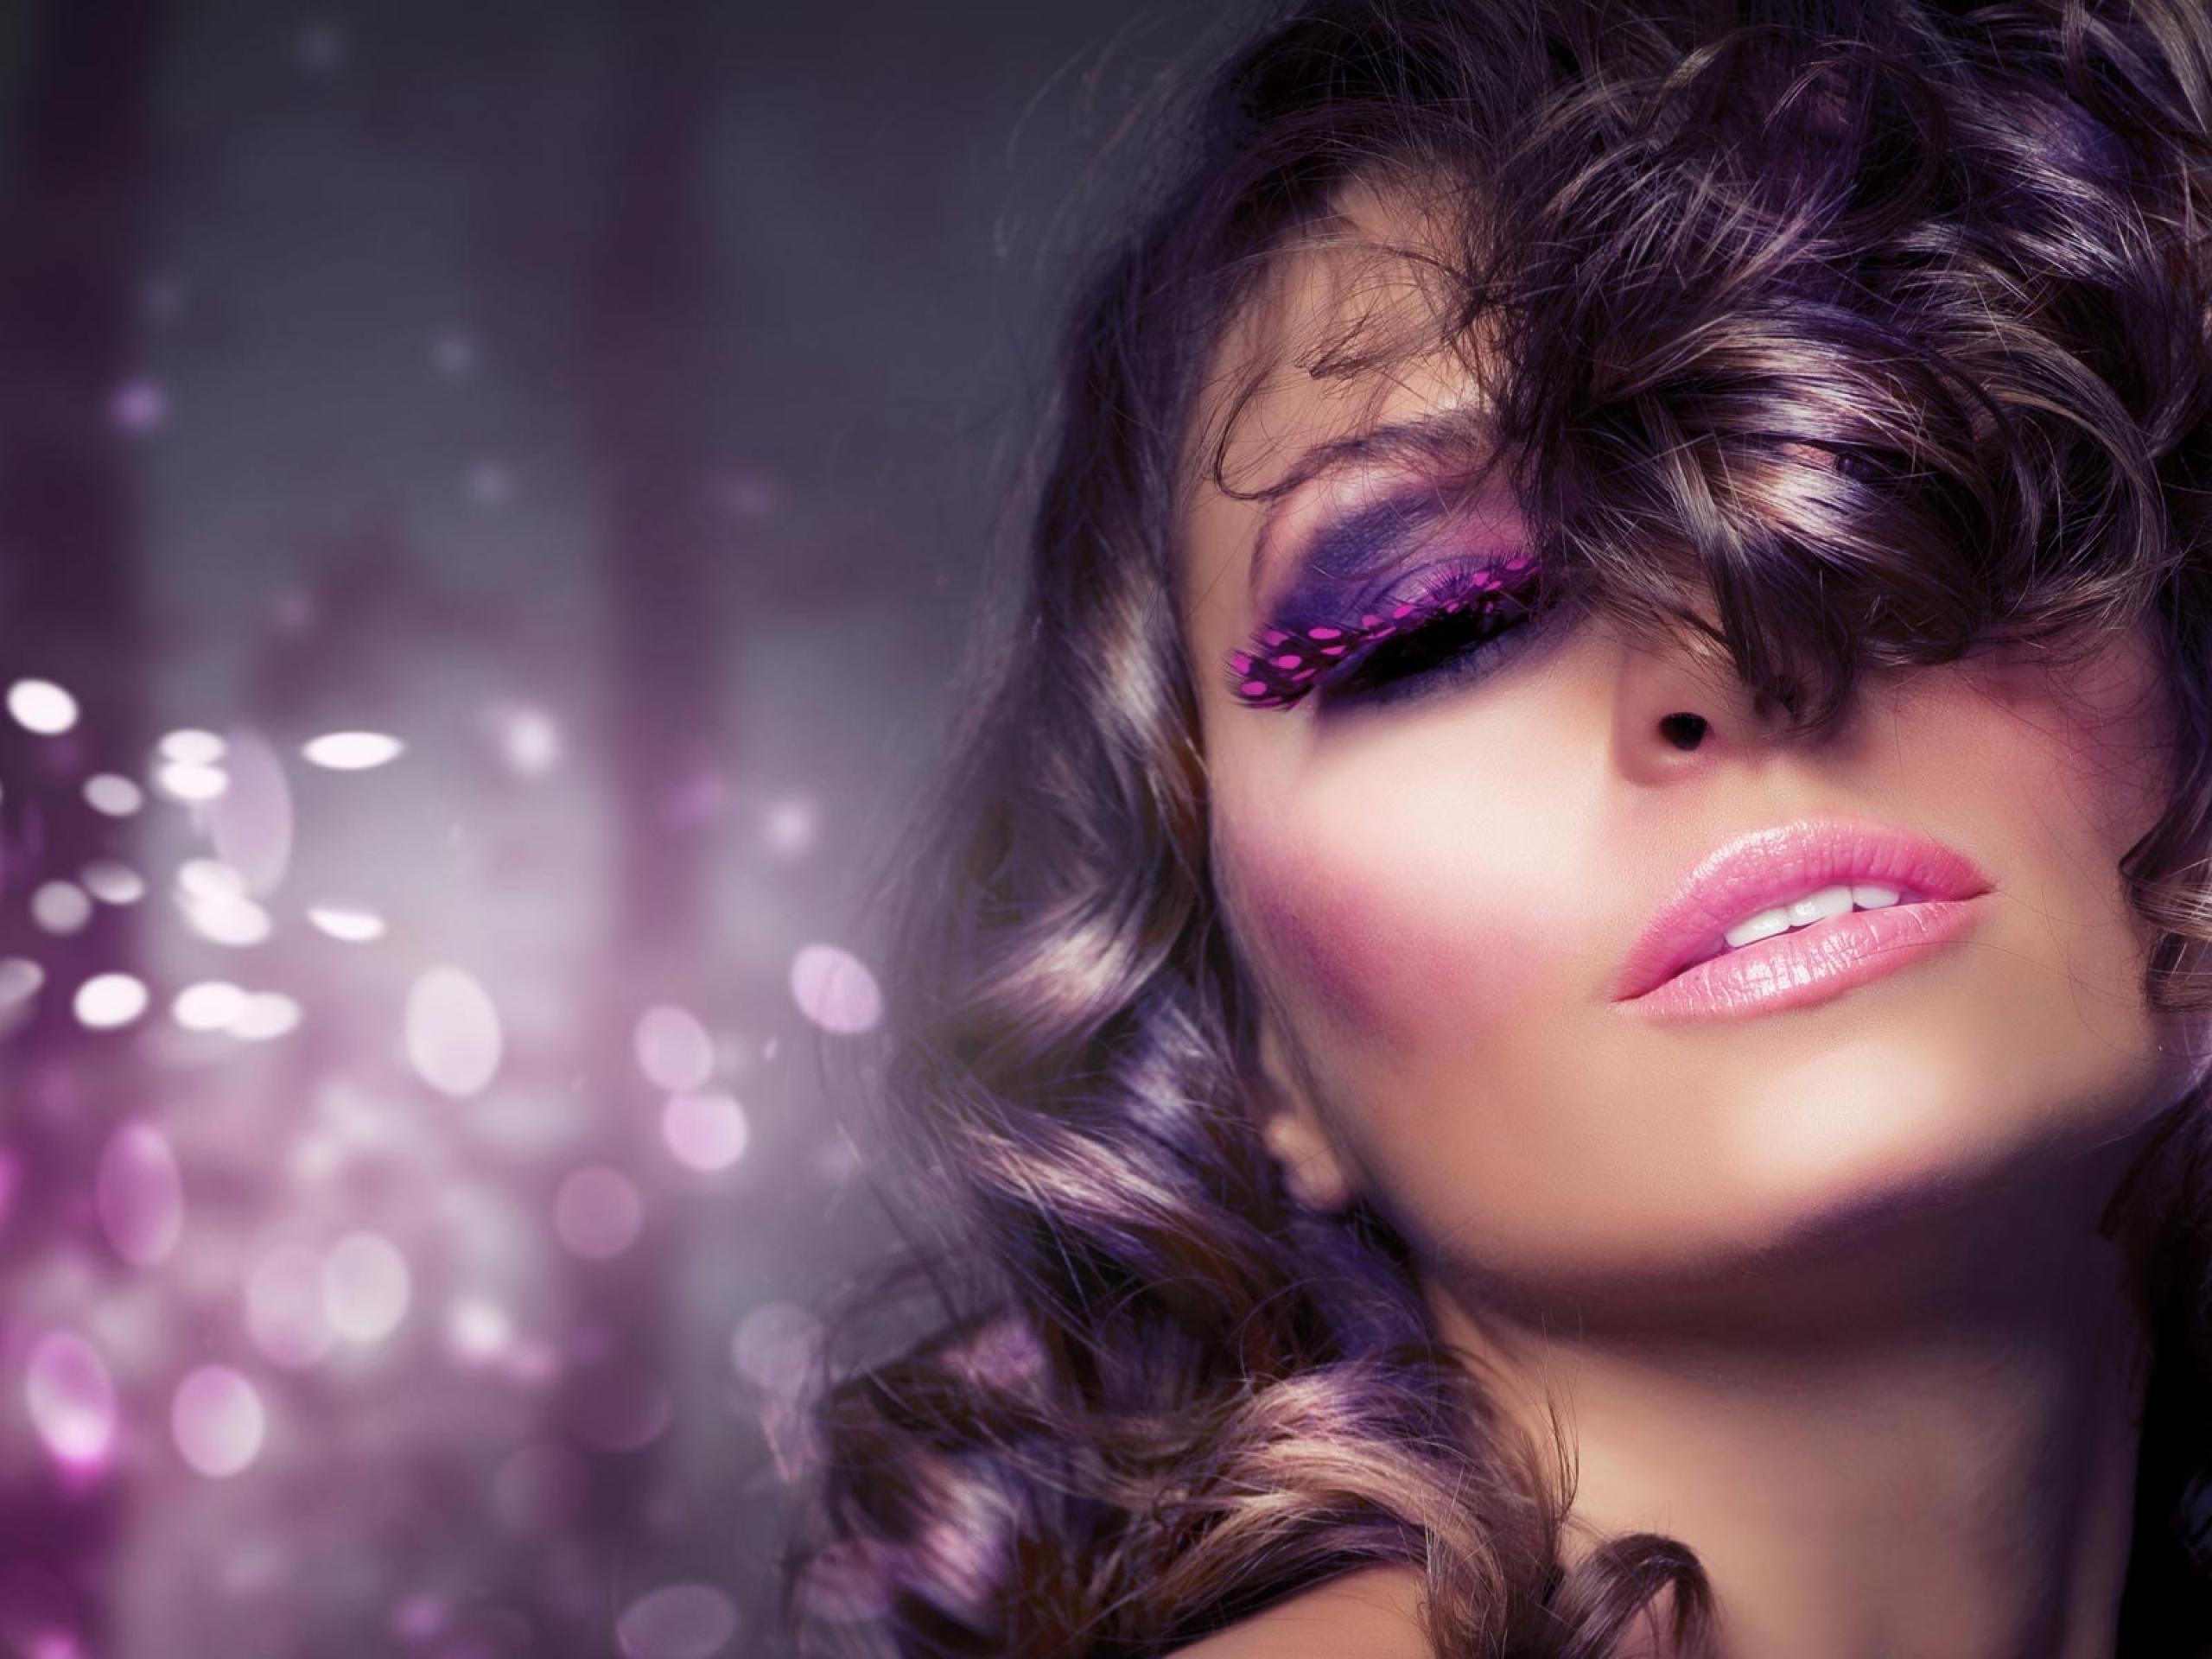 Views: 651 Makeup Wallpaper 23359